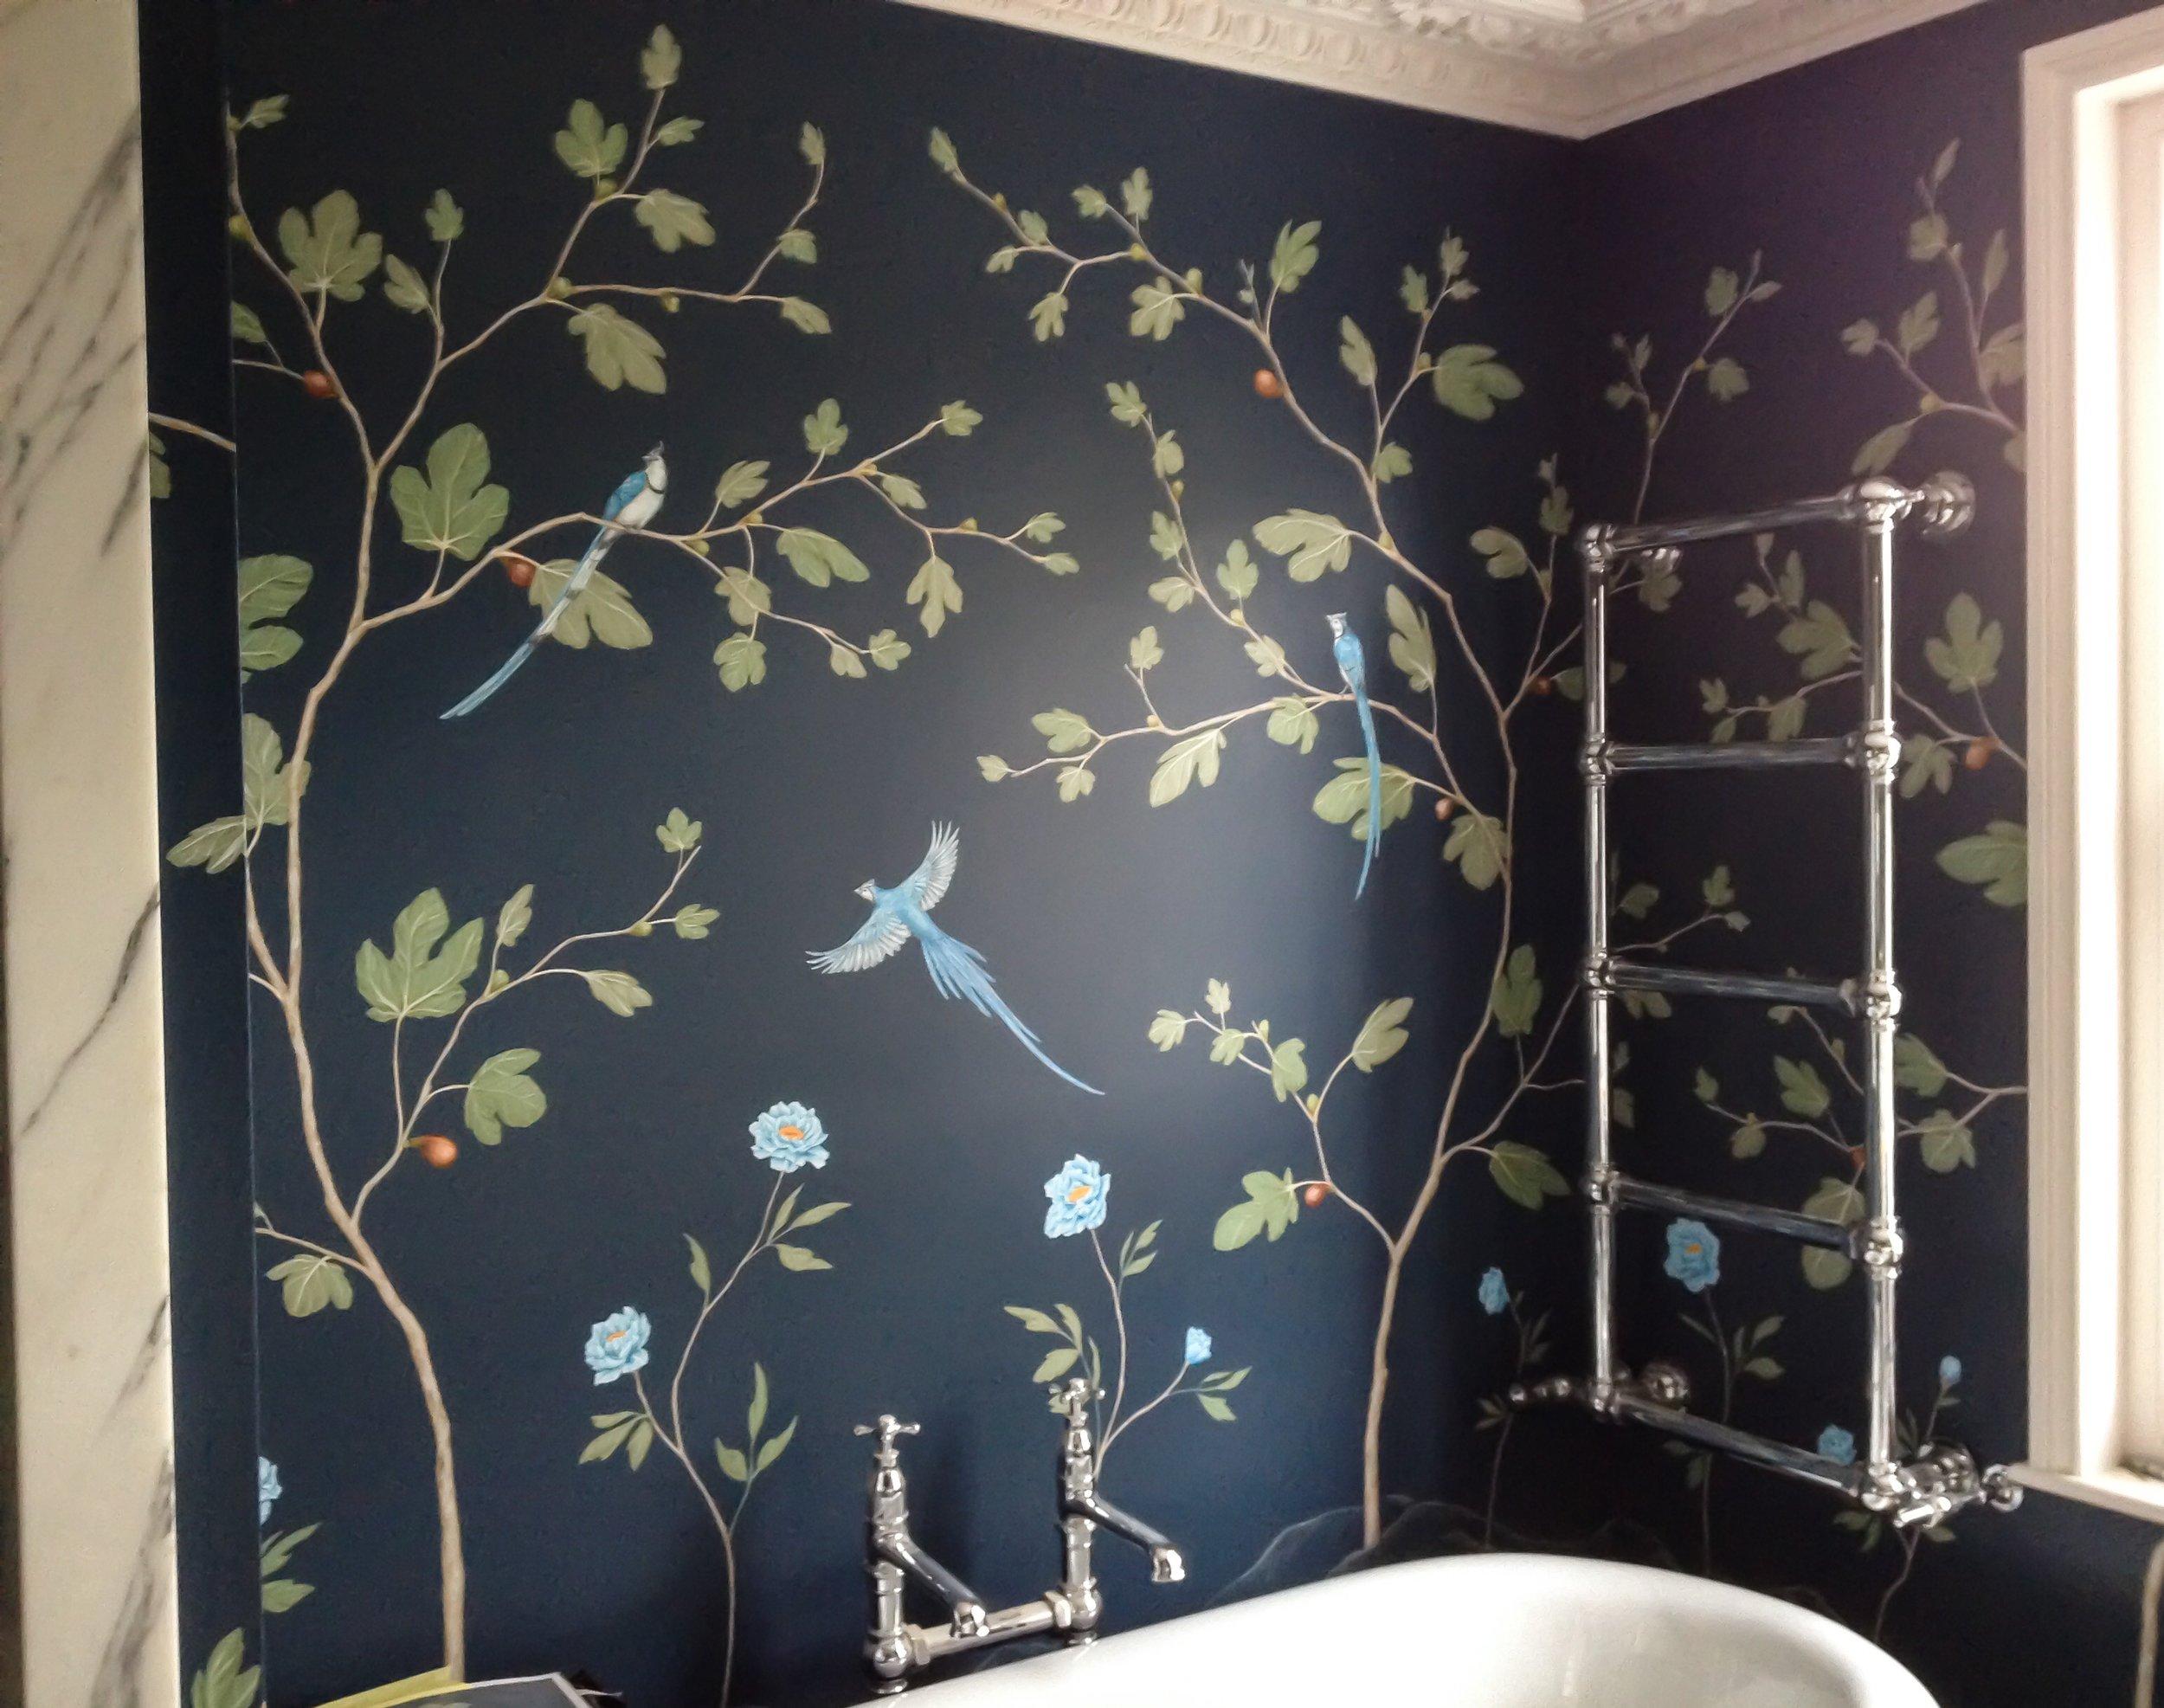 fig and jay bathroom mural, frederick Wimsett bespoke wall art